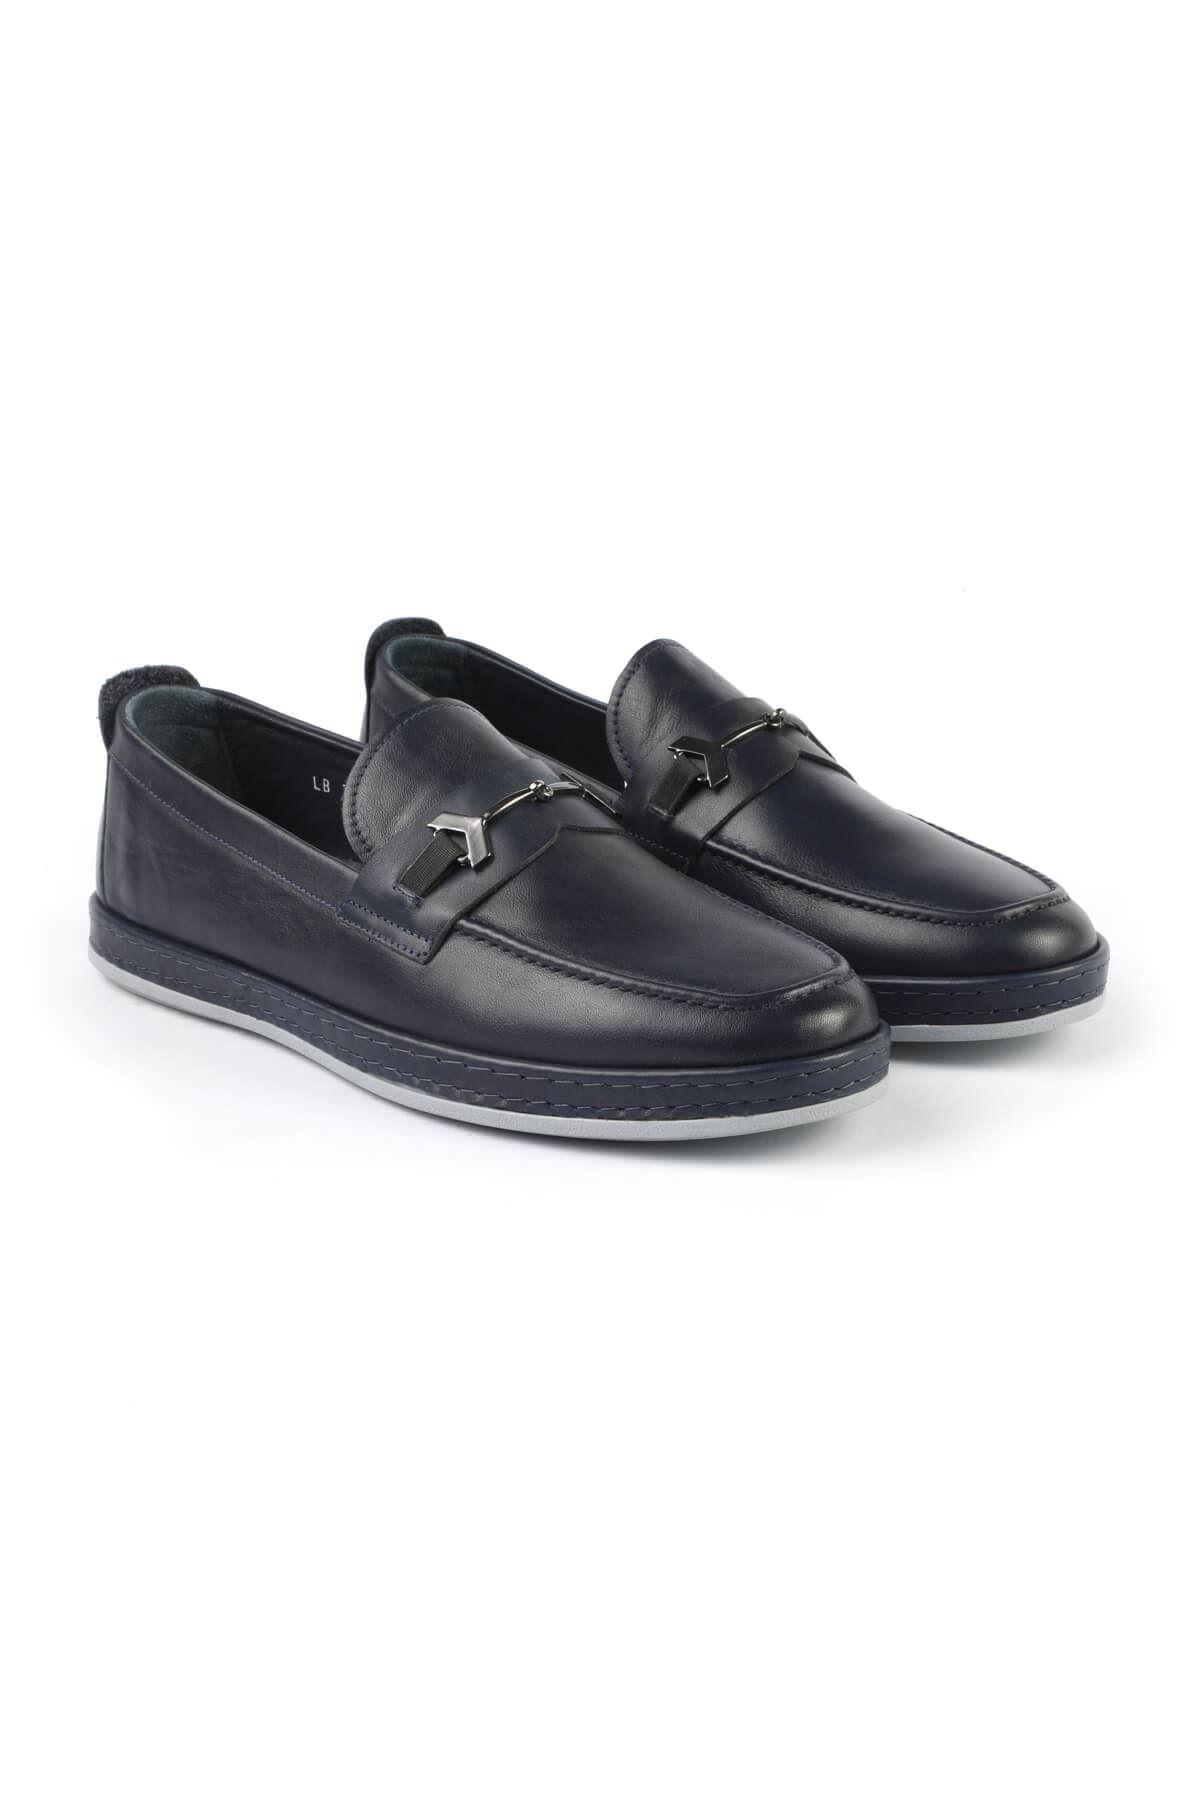 Libero 3075 Lacivert Loafer Ayakkabı